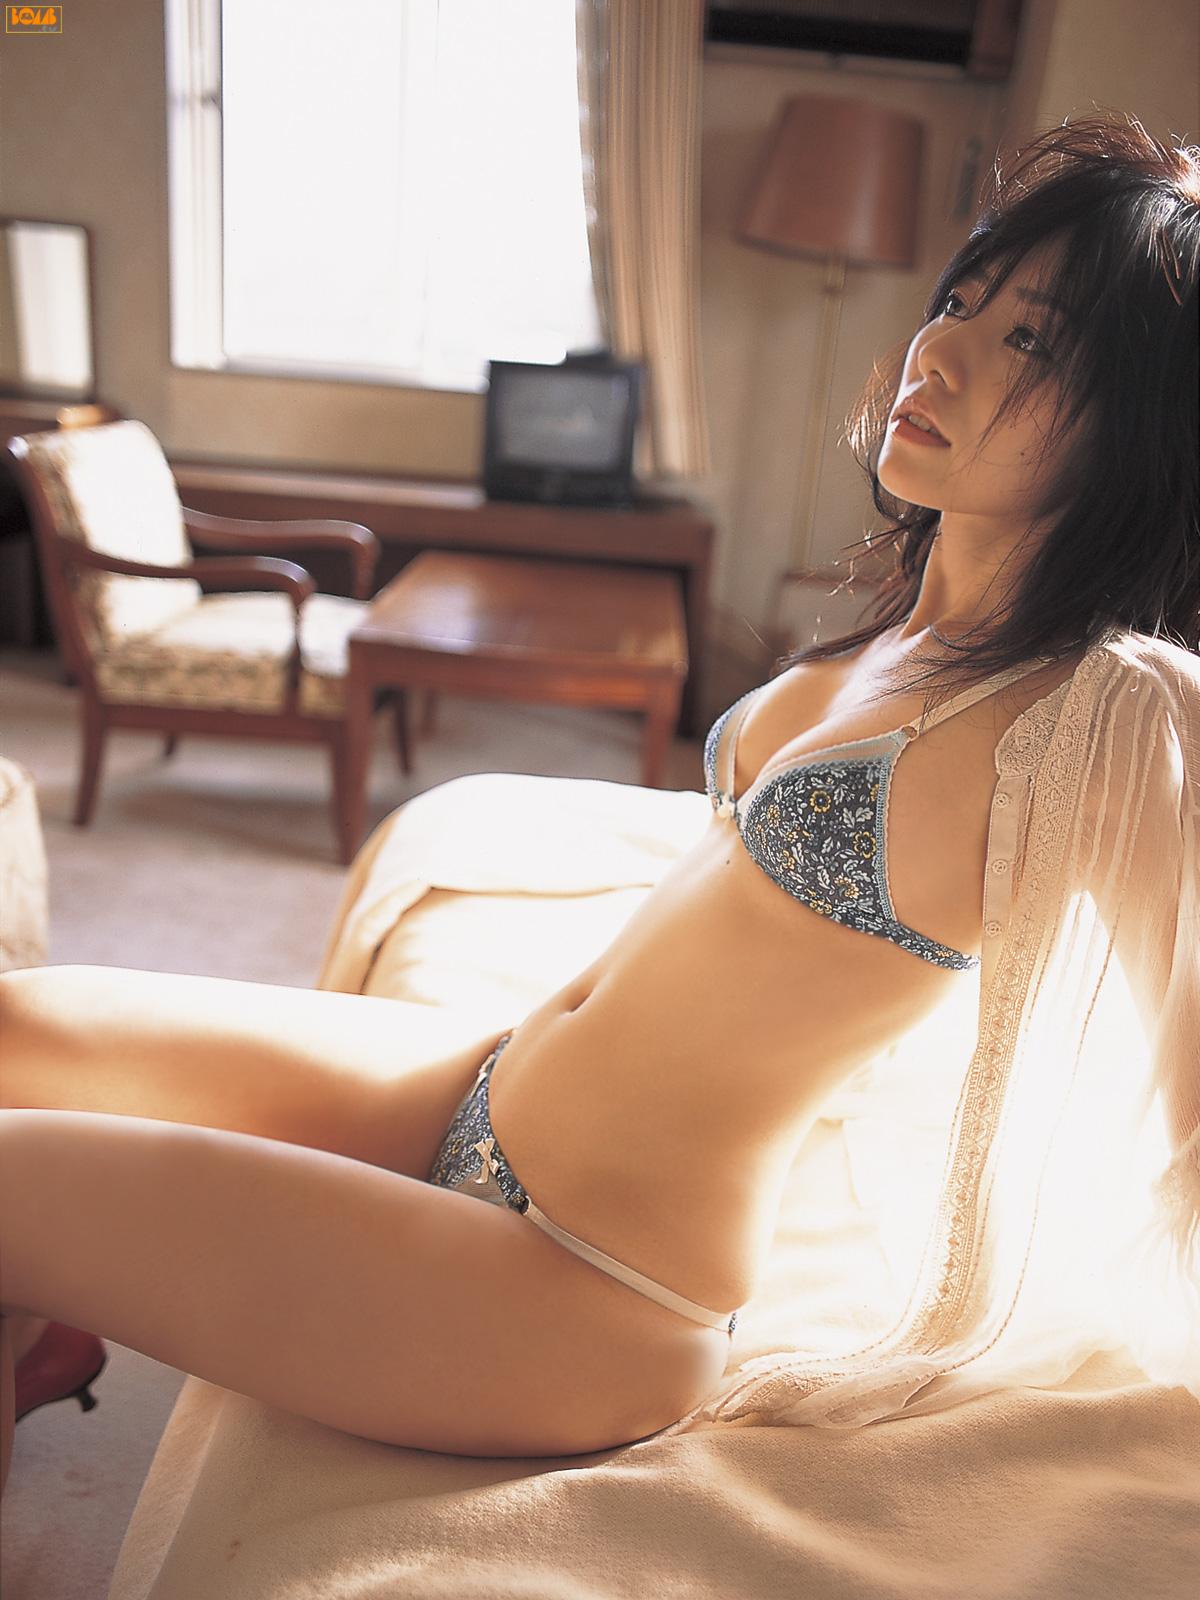 tm019-jpg Momoko Tani - Bomb.tv 谷桃子 momoko 08110